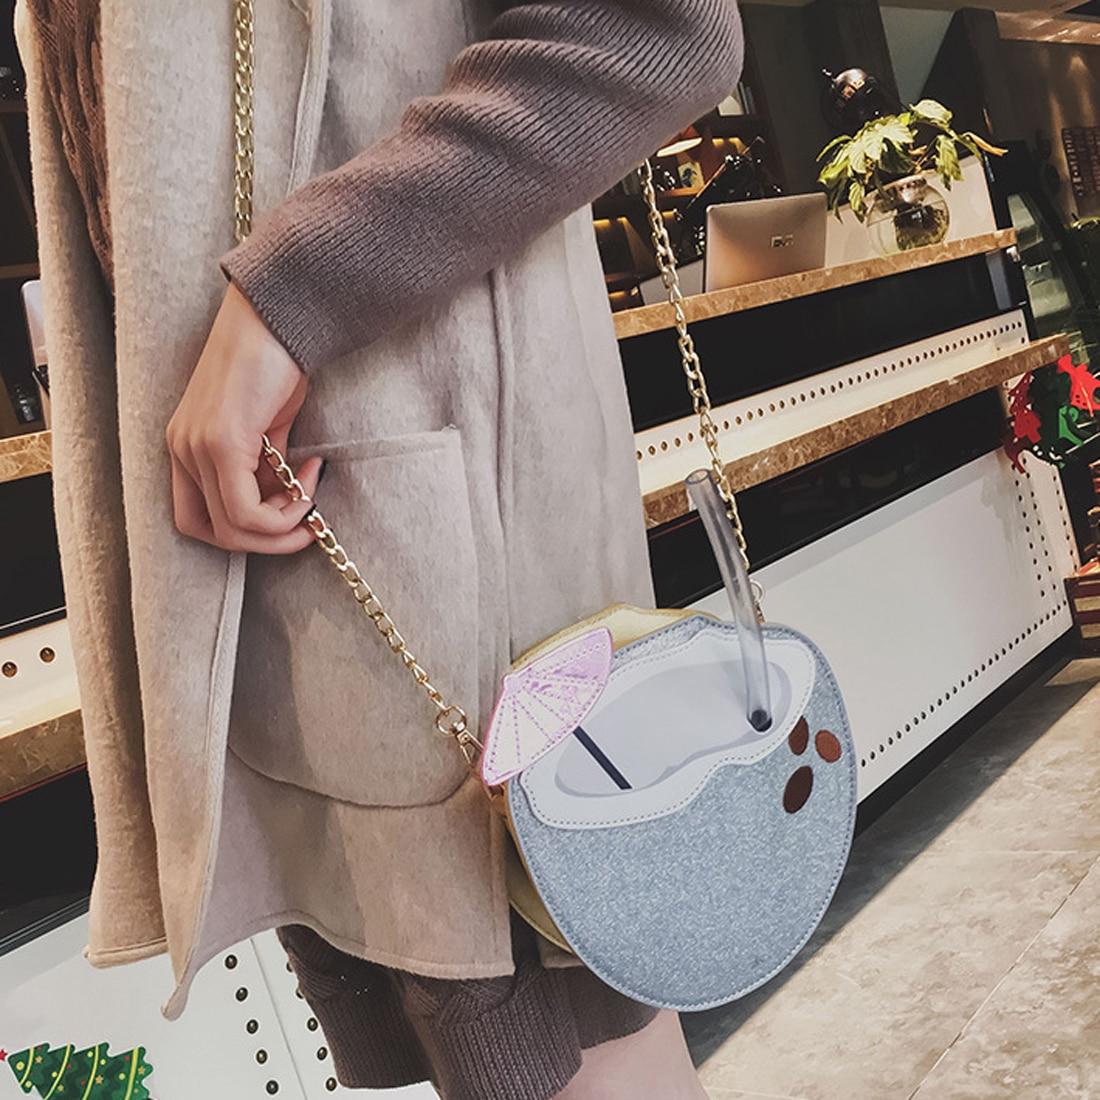 1ecc39439439 Cute coconut pattern bags girls blingbling creative fashion women jpg  1100x1100 Creative fashion bag